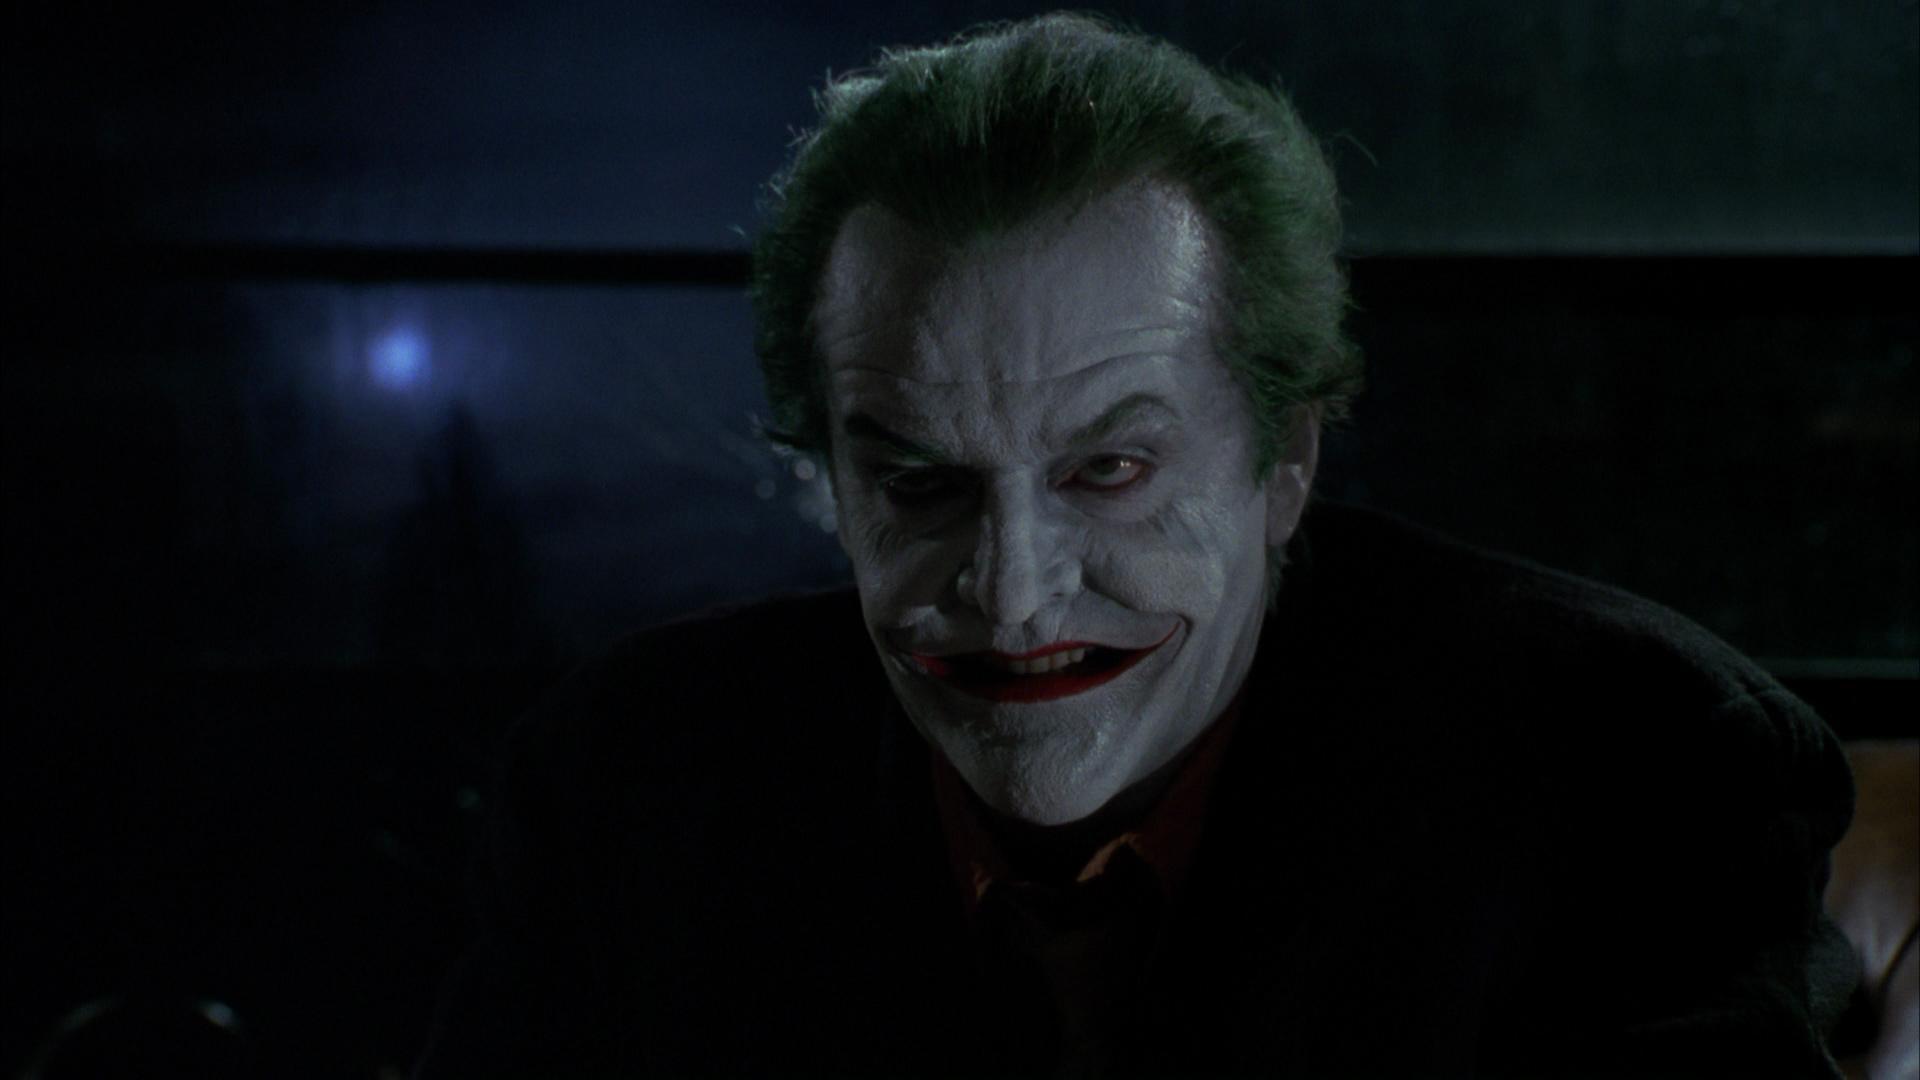 Jack Nicholson Joker wallpaper 93395 1920x1080